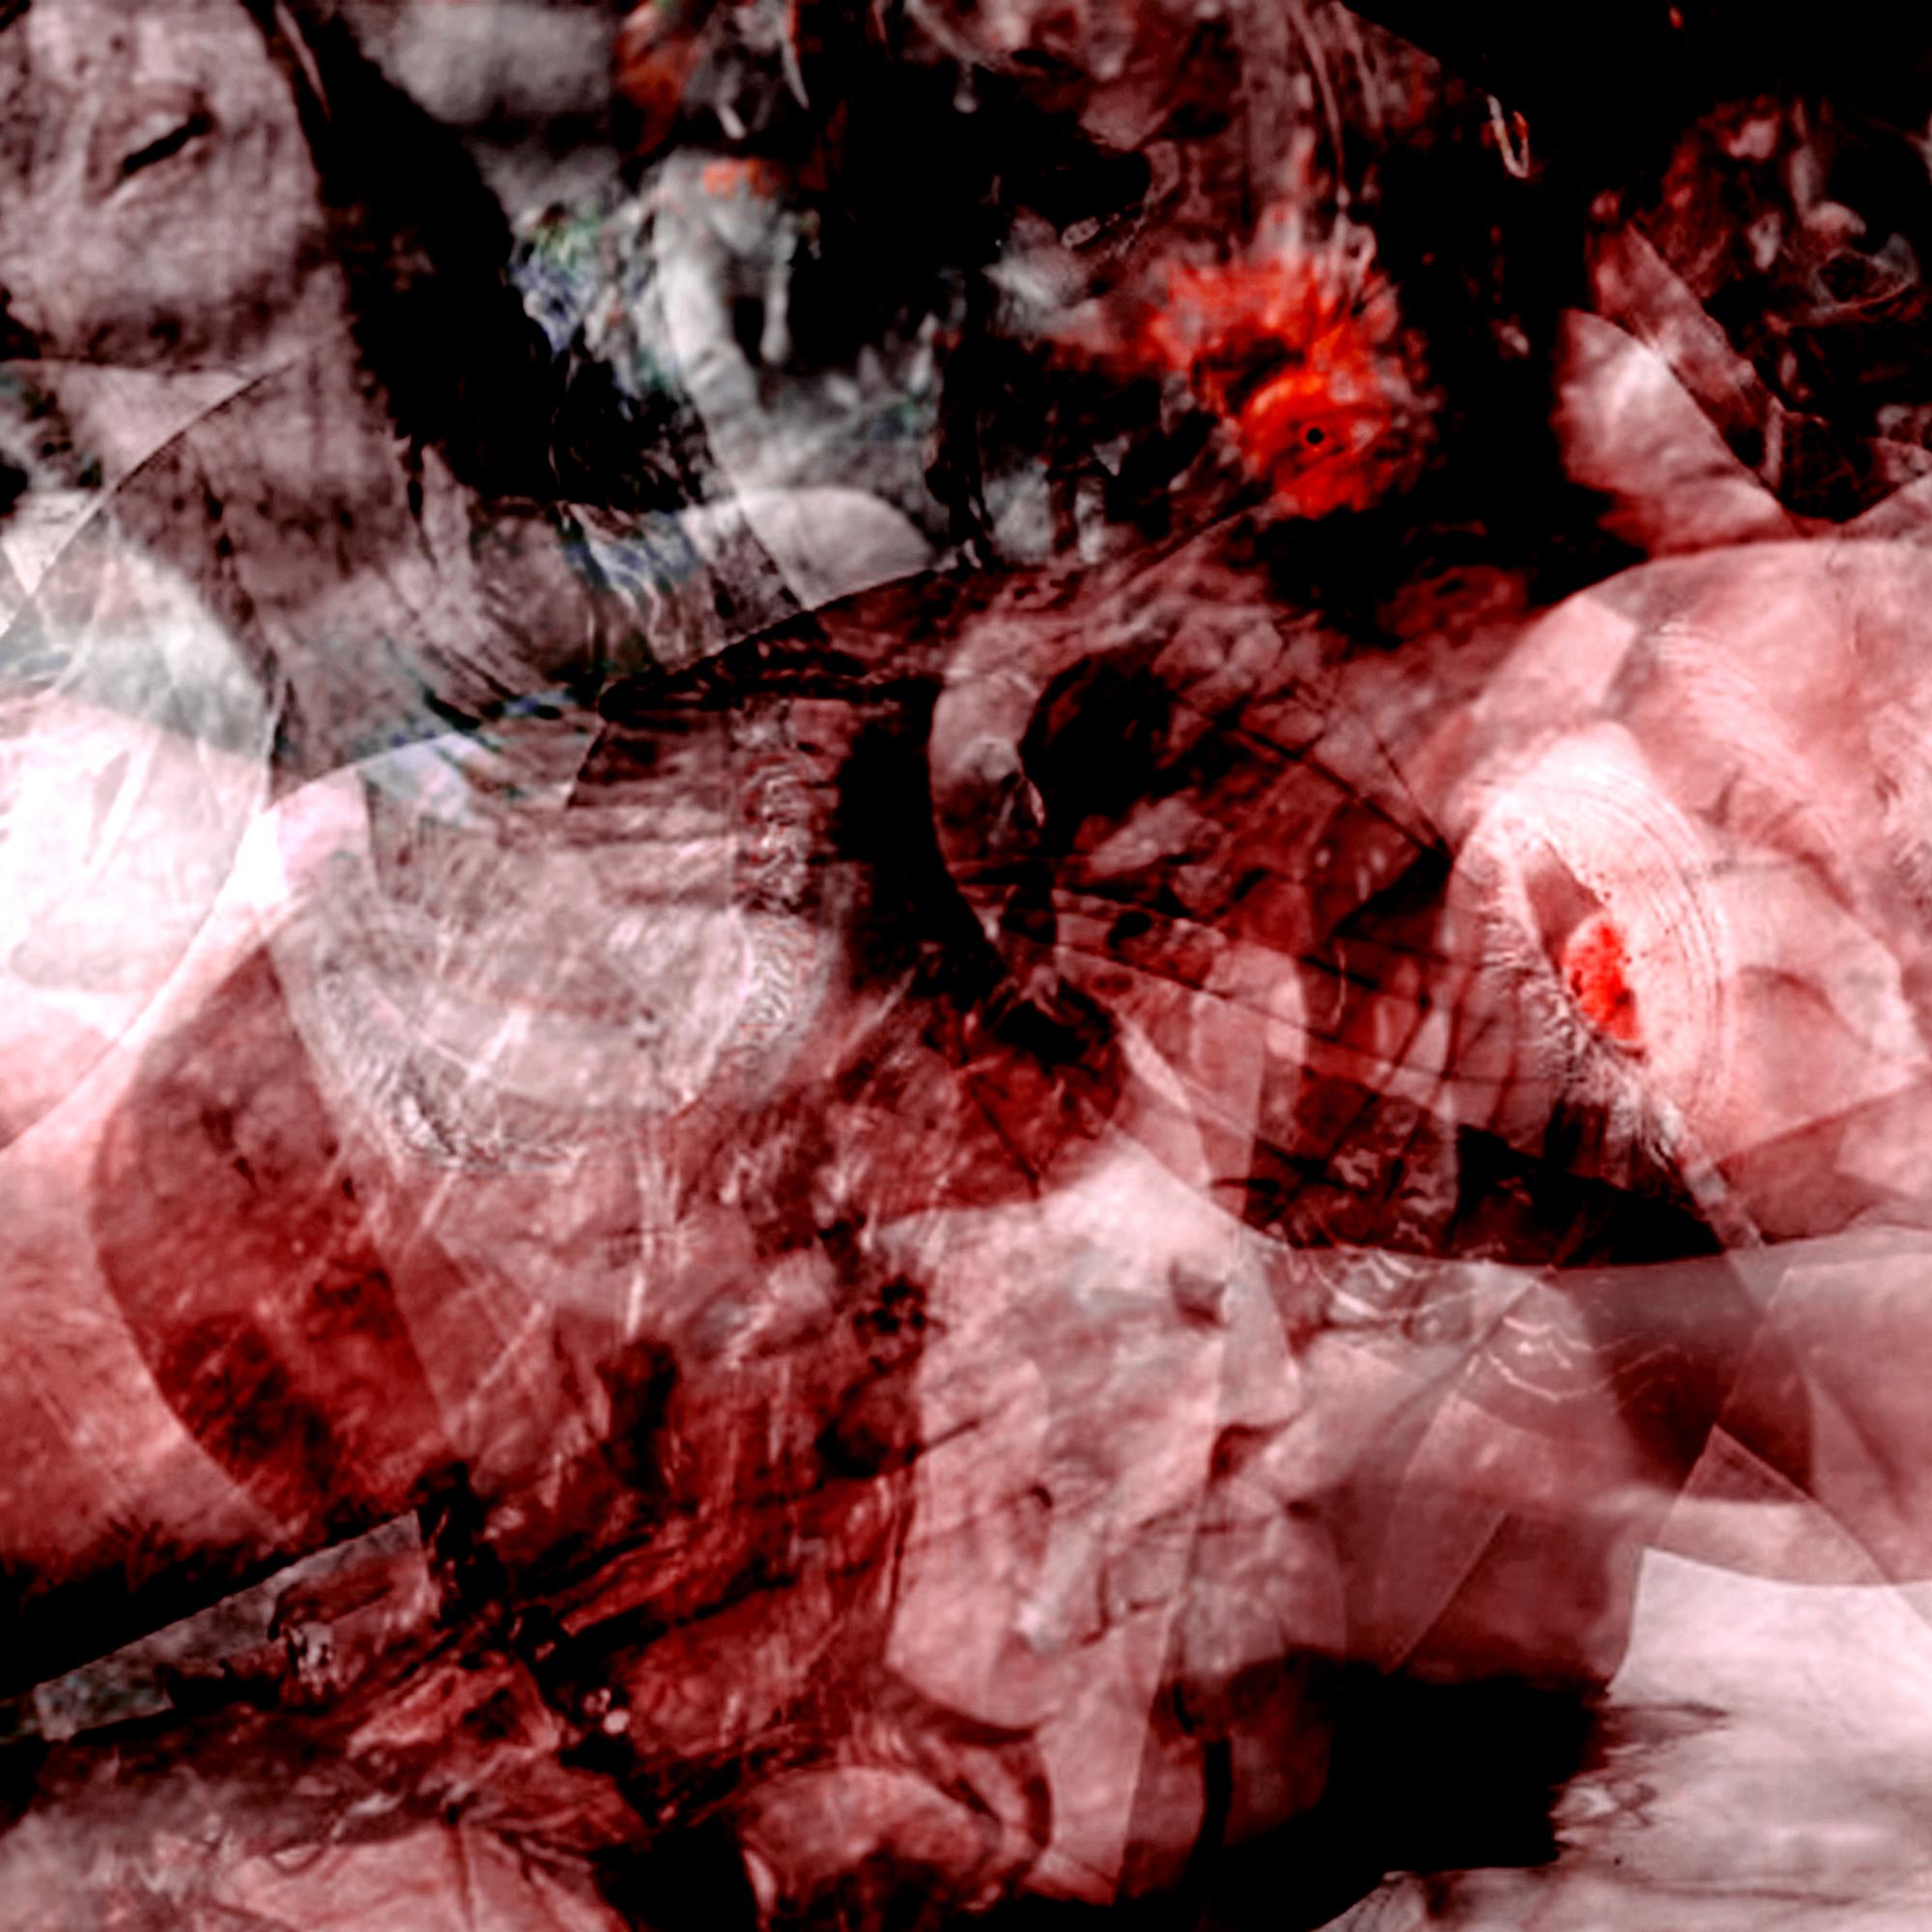 Overdose 18 (Monoptych), 2007